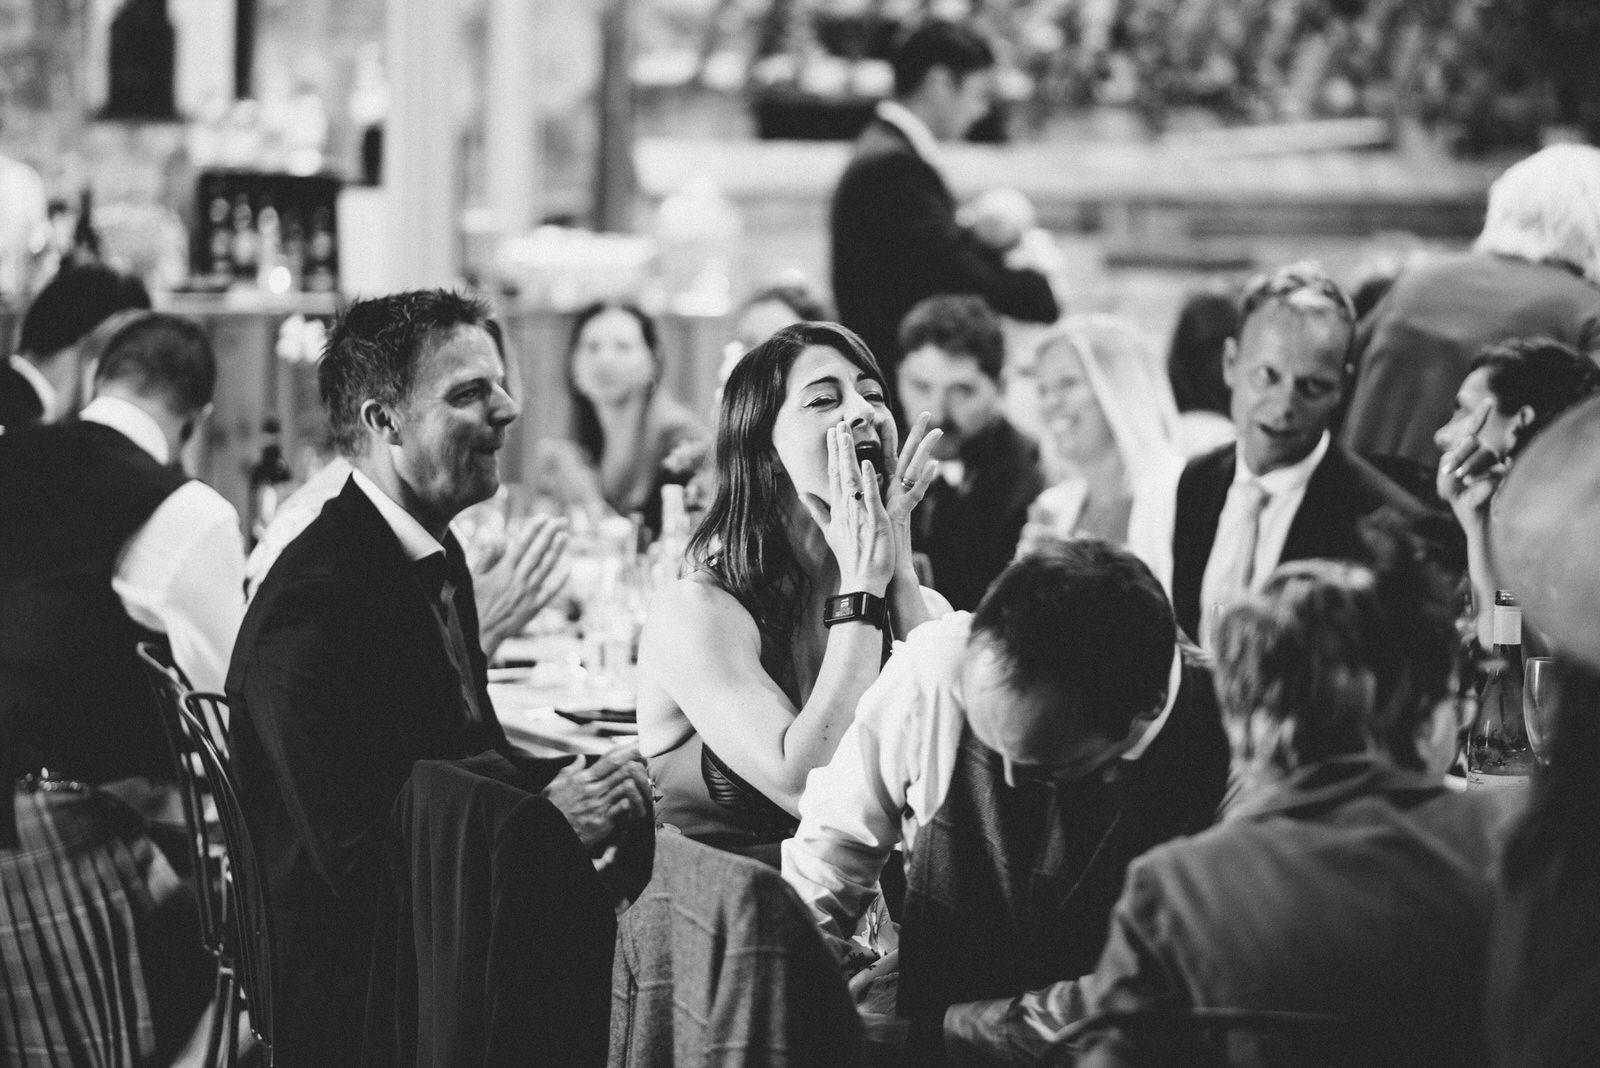 048-GUARDSWELL-FARM-WEDDING-ALTERNATIVE-SCOTTISH-WEDDING-PHOTOGRAPHER-SCOTTISH-WEDDING-DESTINATION-WEDDING-PHOTOGRAPHER.JPG